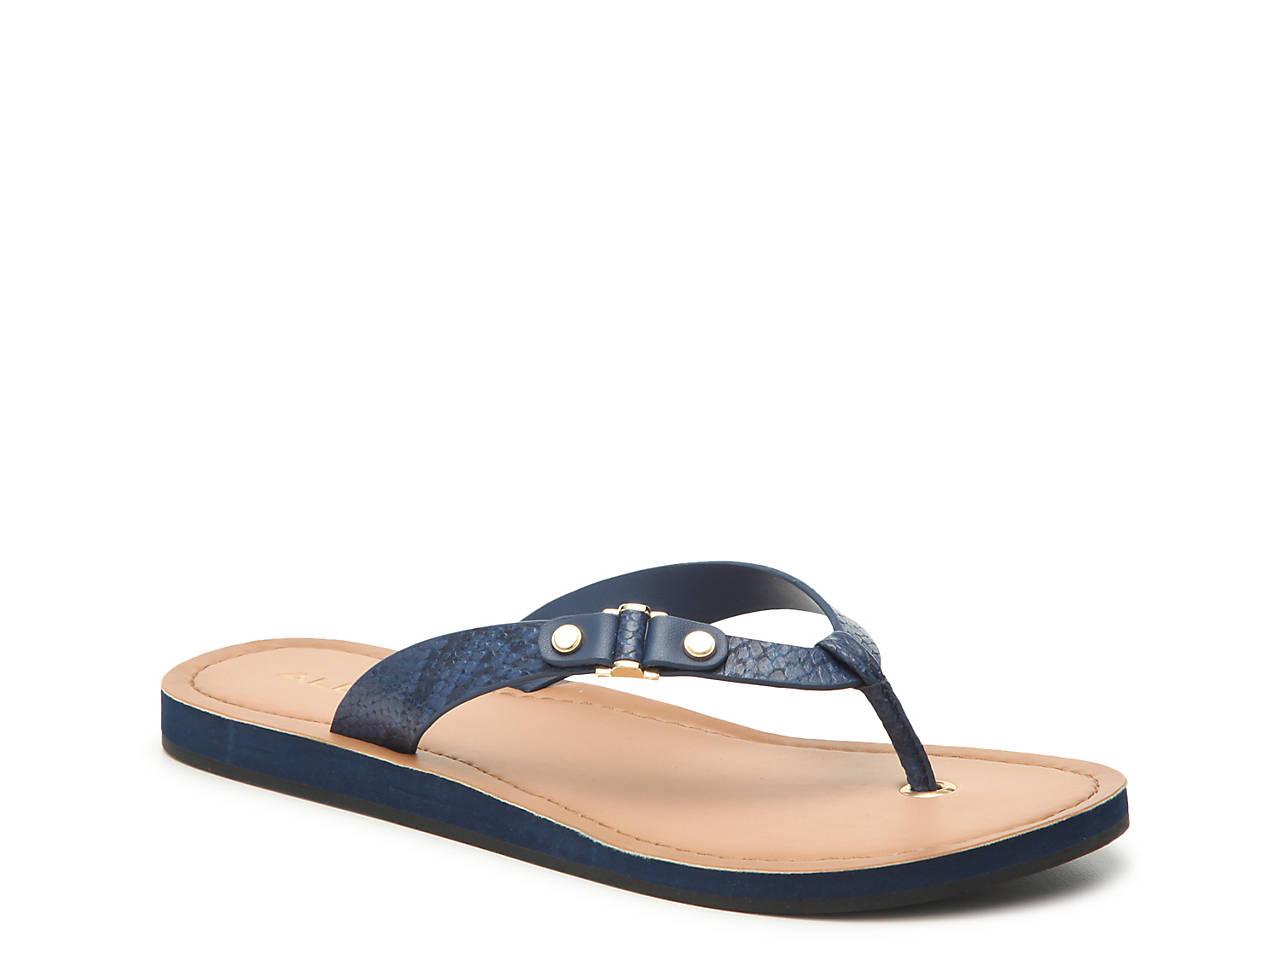 d4505beb2 Aldo Prardodia Sandal Women s Shoes